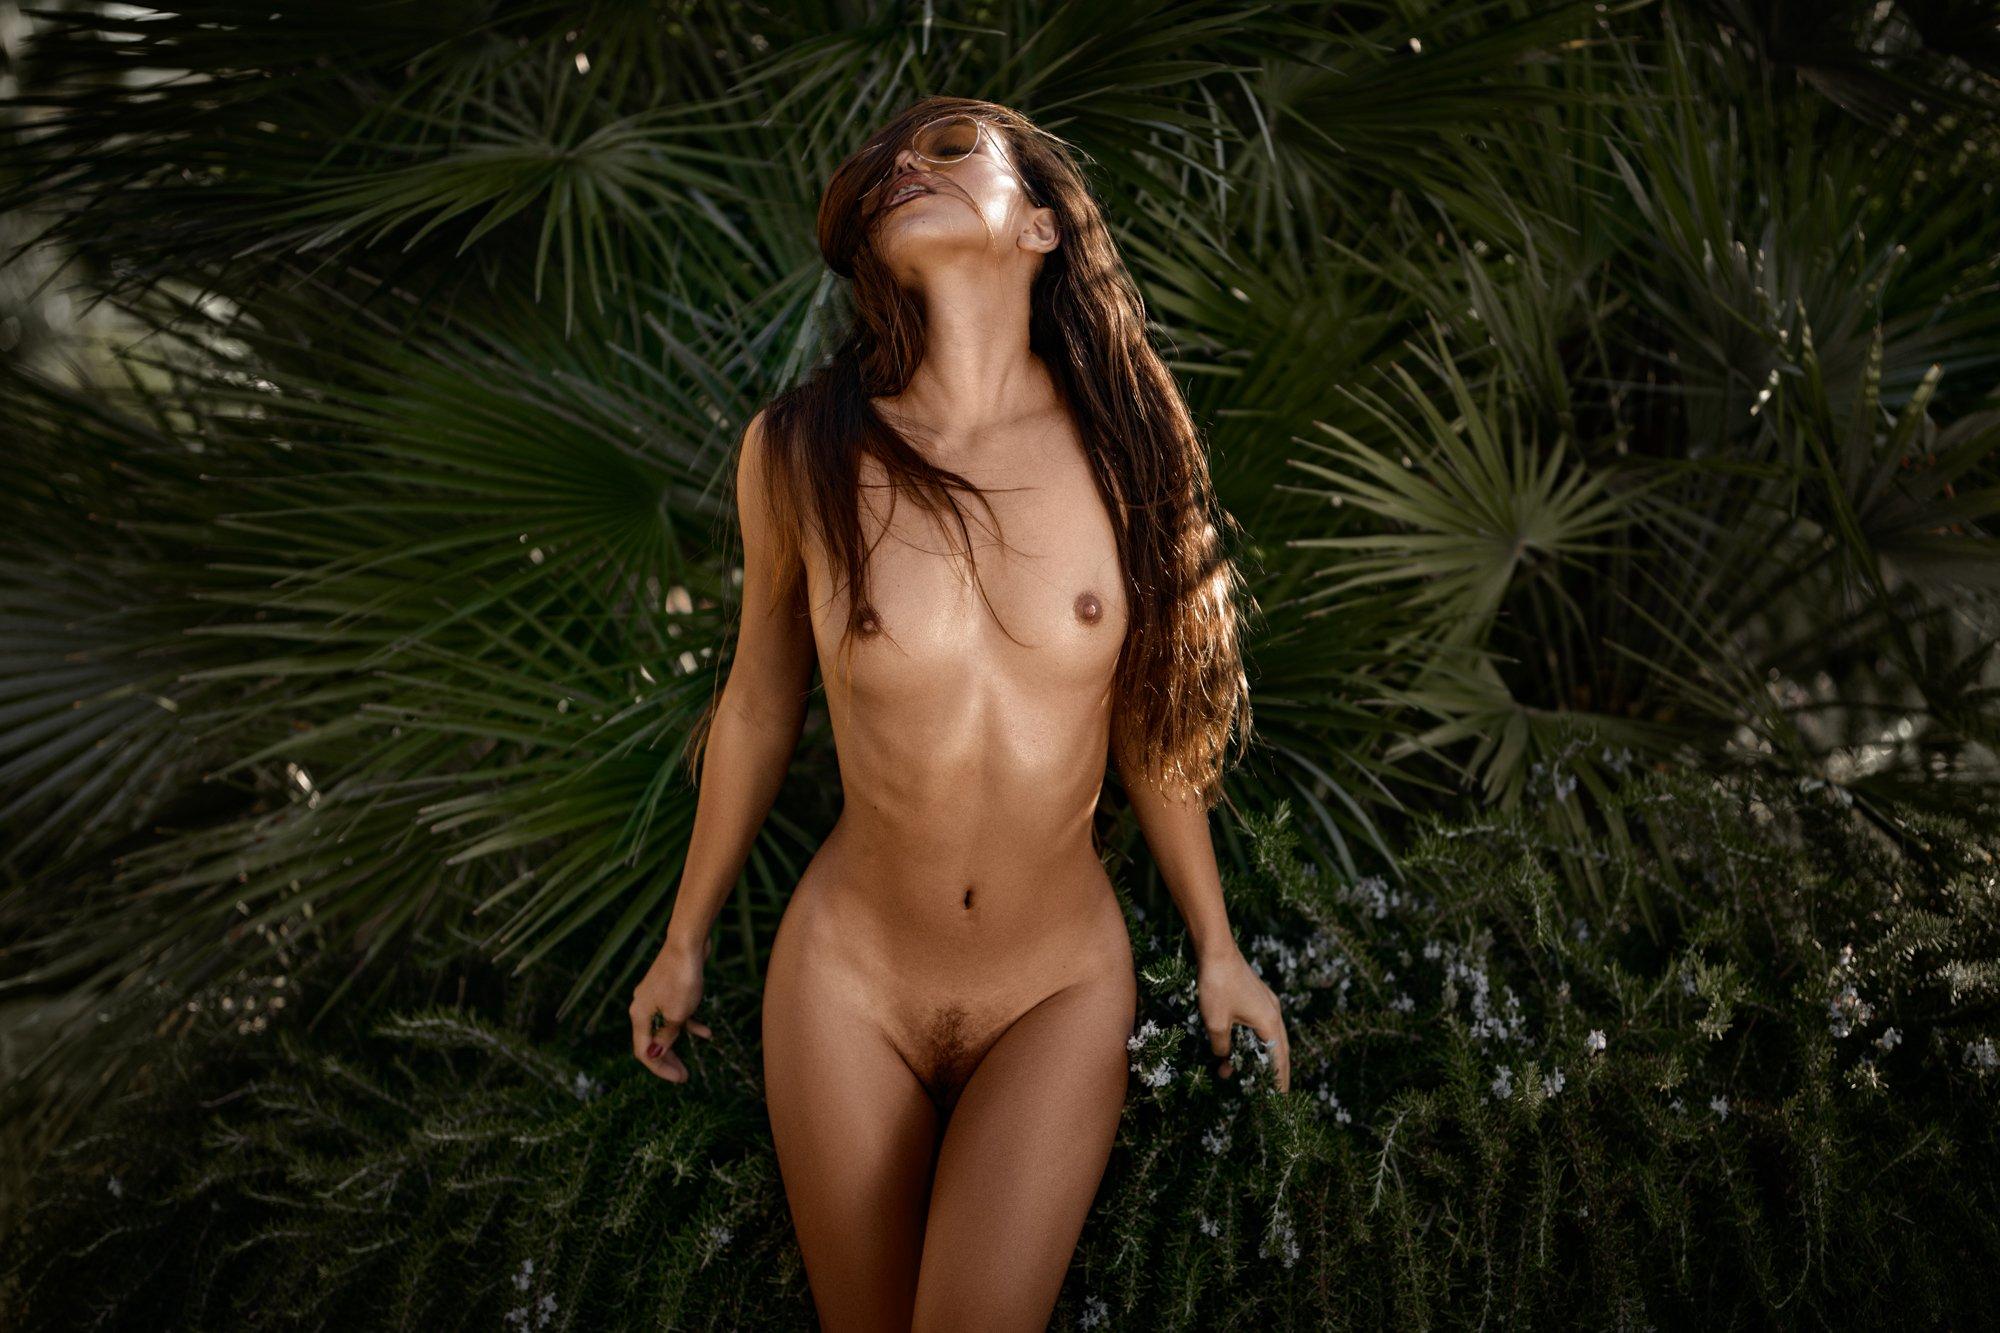 nude, sexy, girl, sun, pure, woman, skin, freedom, emotion, sensual, seduction,, Leyendecker Sacha